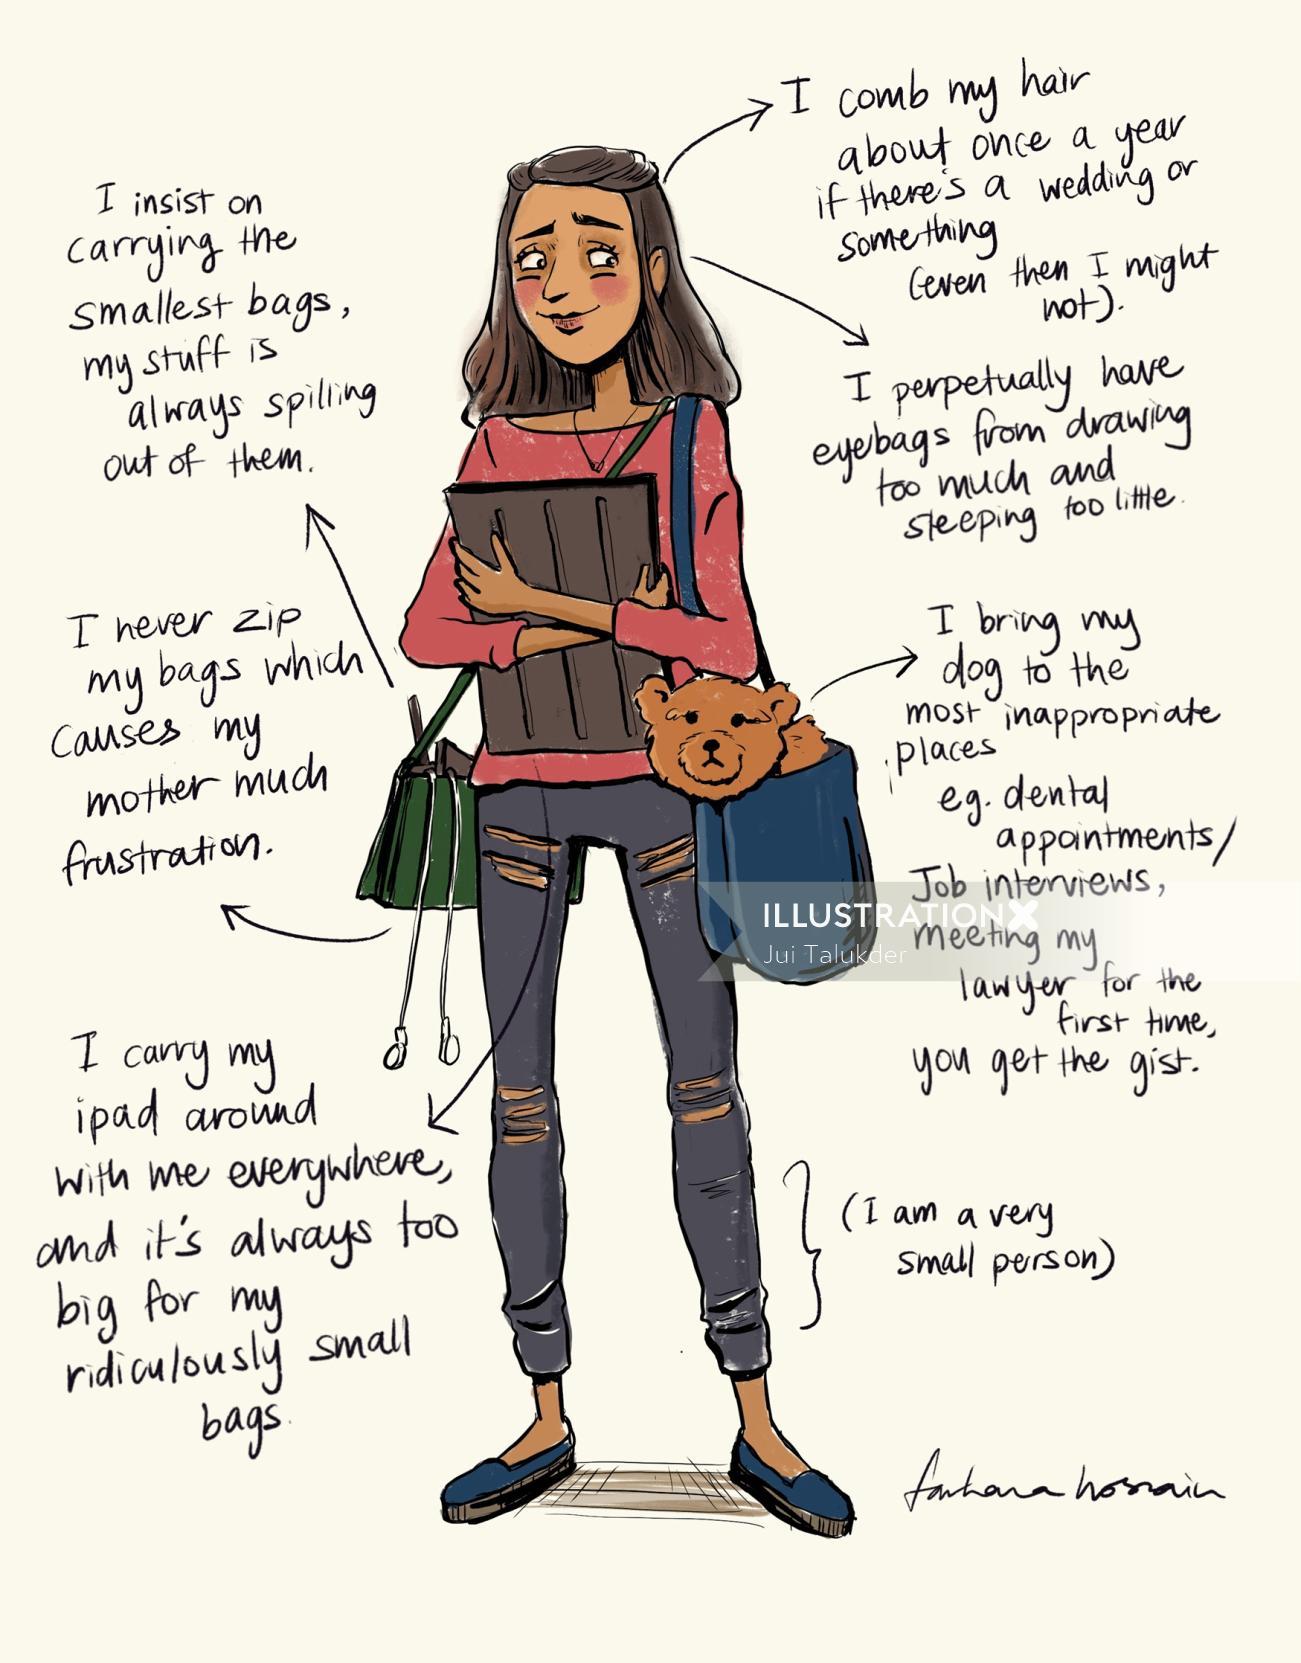 Humorous Self portrait of Farhana Hossain